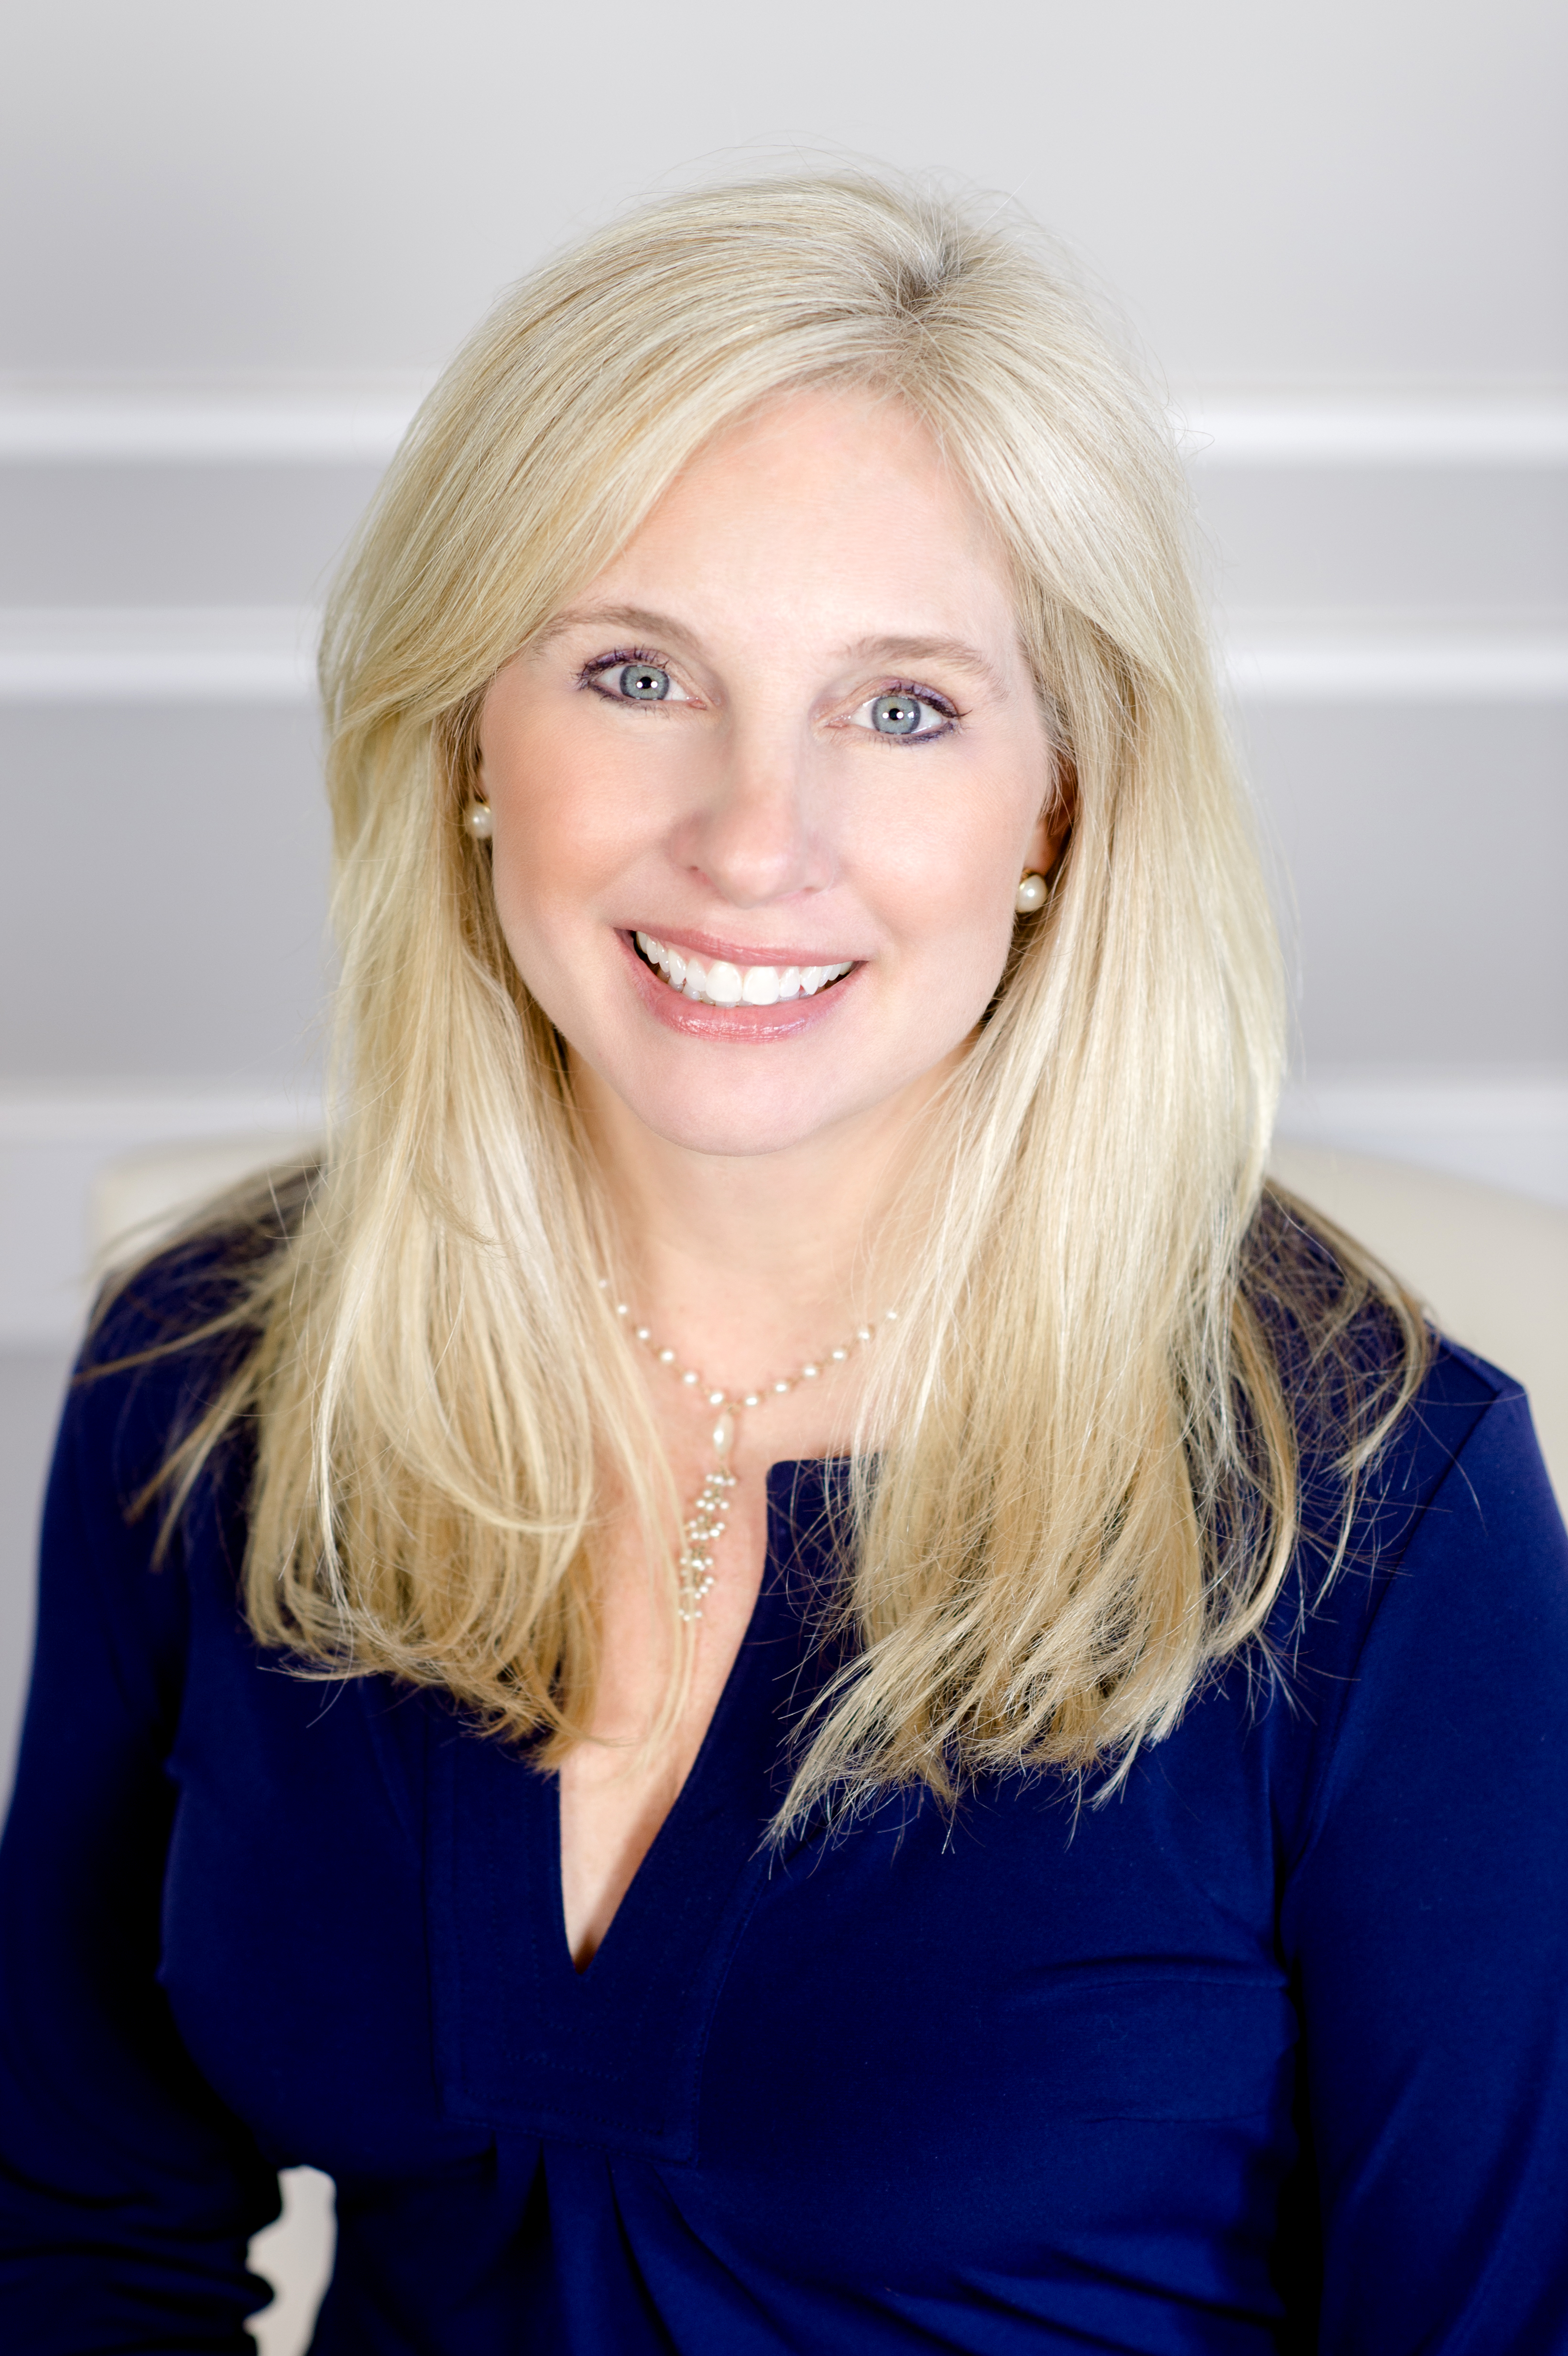 Cora Strahman-Porter